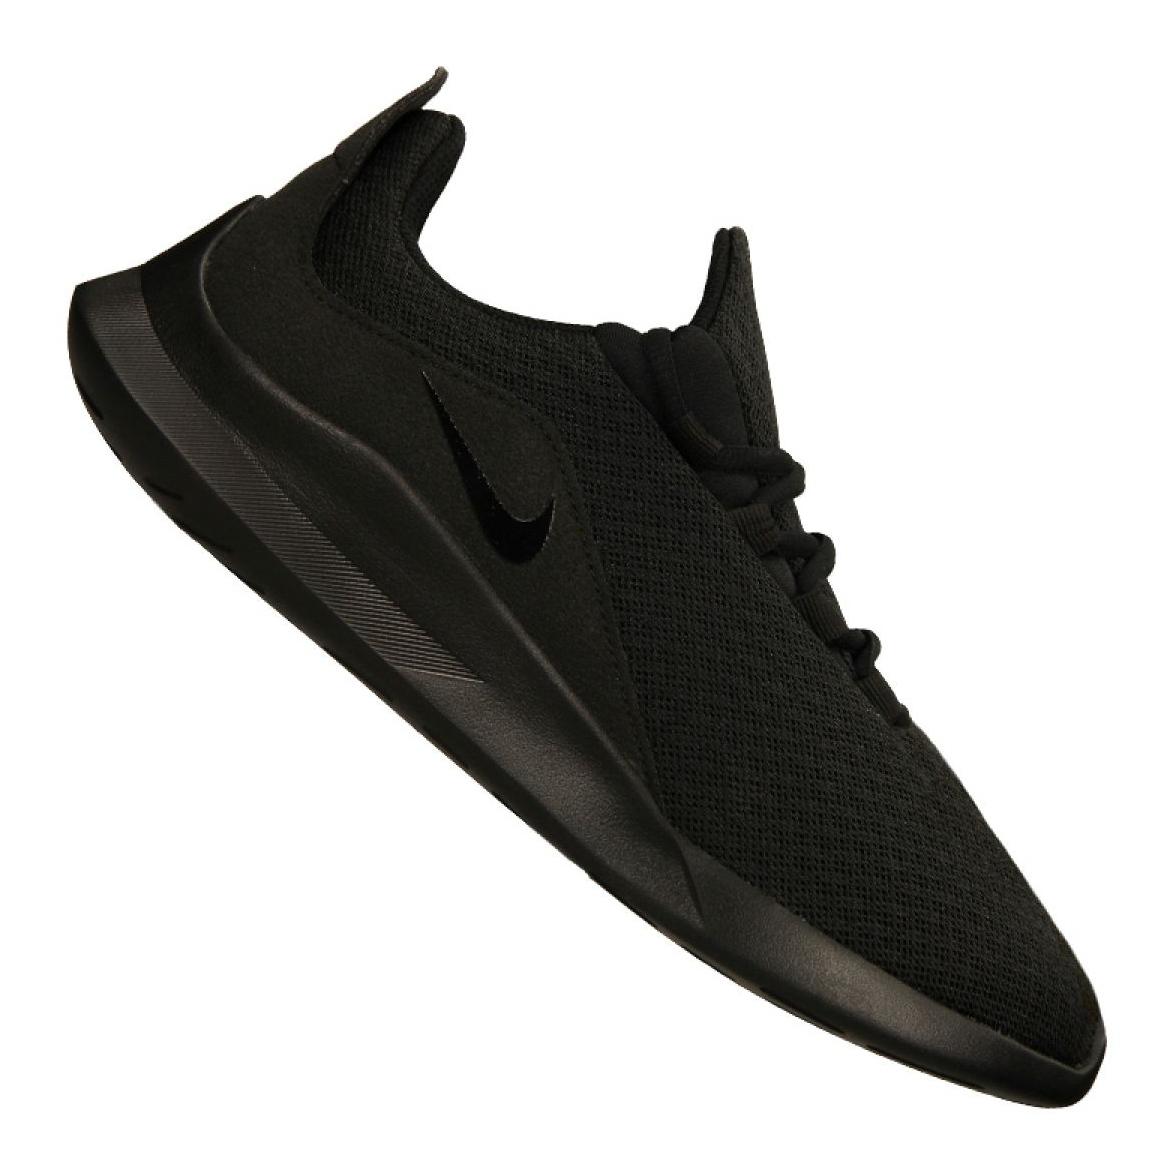 Nike Viale Herren Turnschuhe Sportschuhe Sneaker Laufschuhe